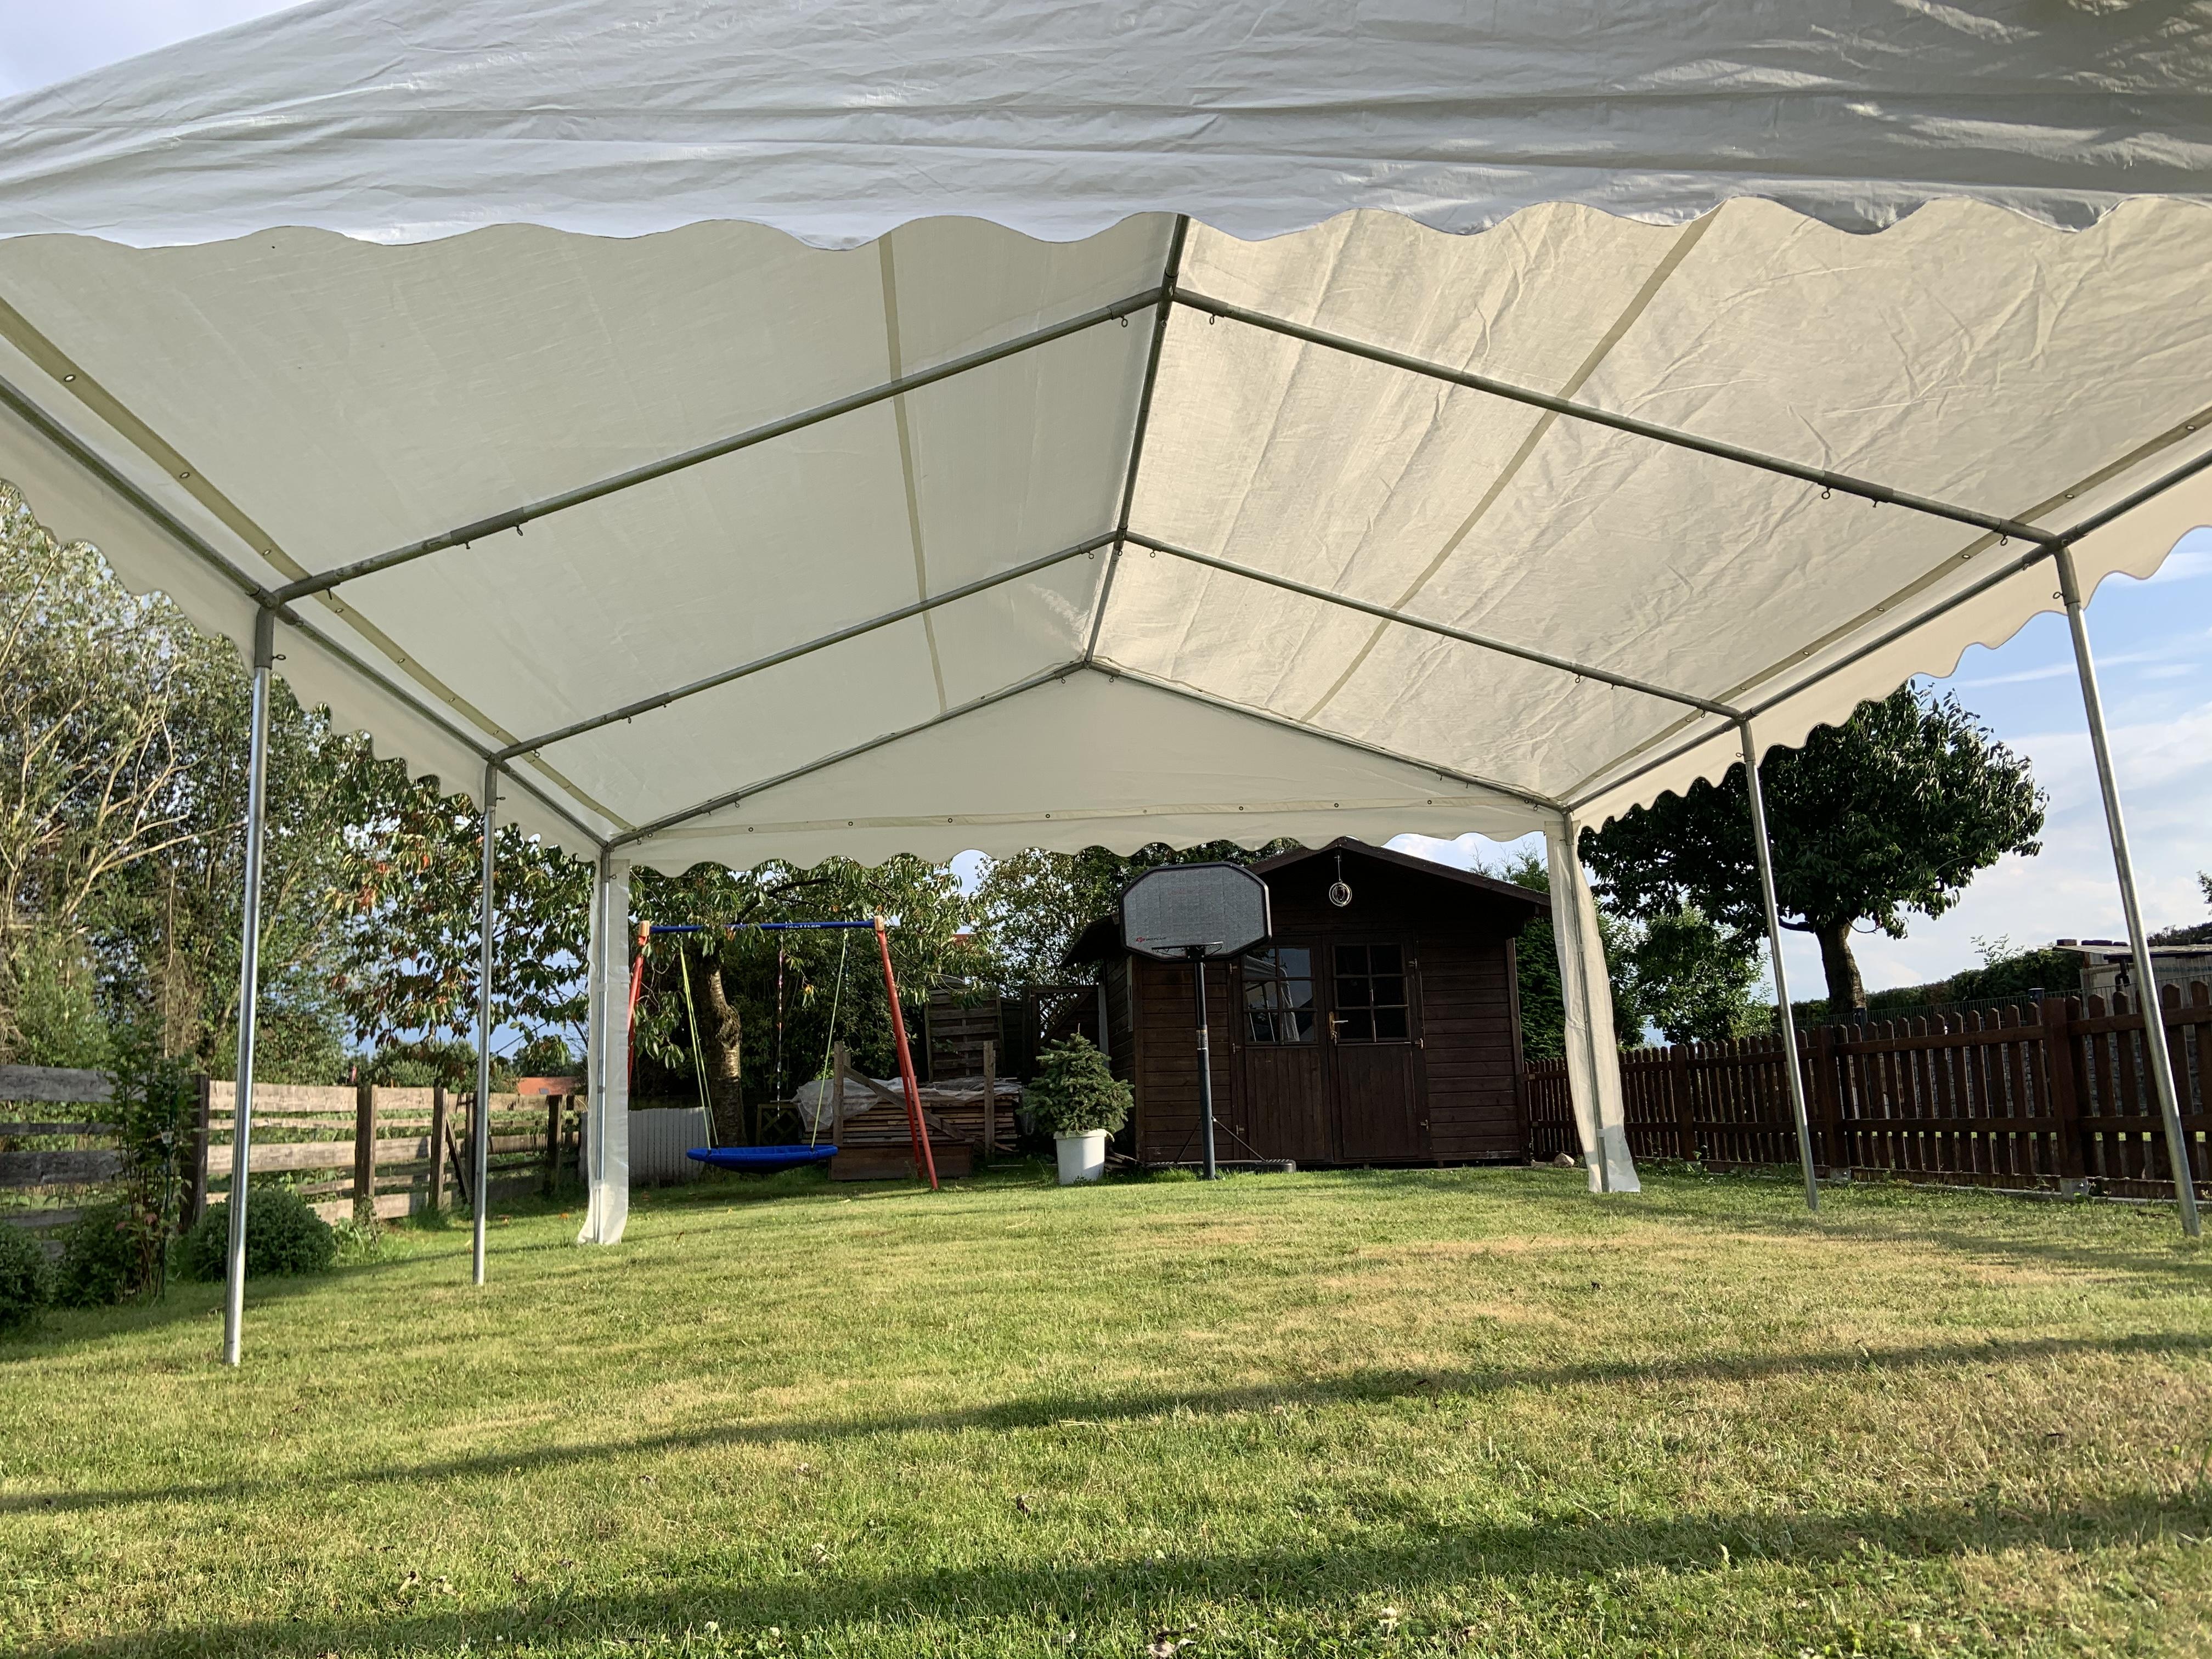 Partyzelt, Festzelt, Zelt 5x8m mieten in Bielefeld